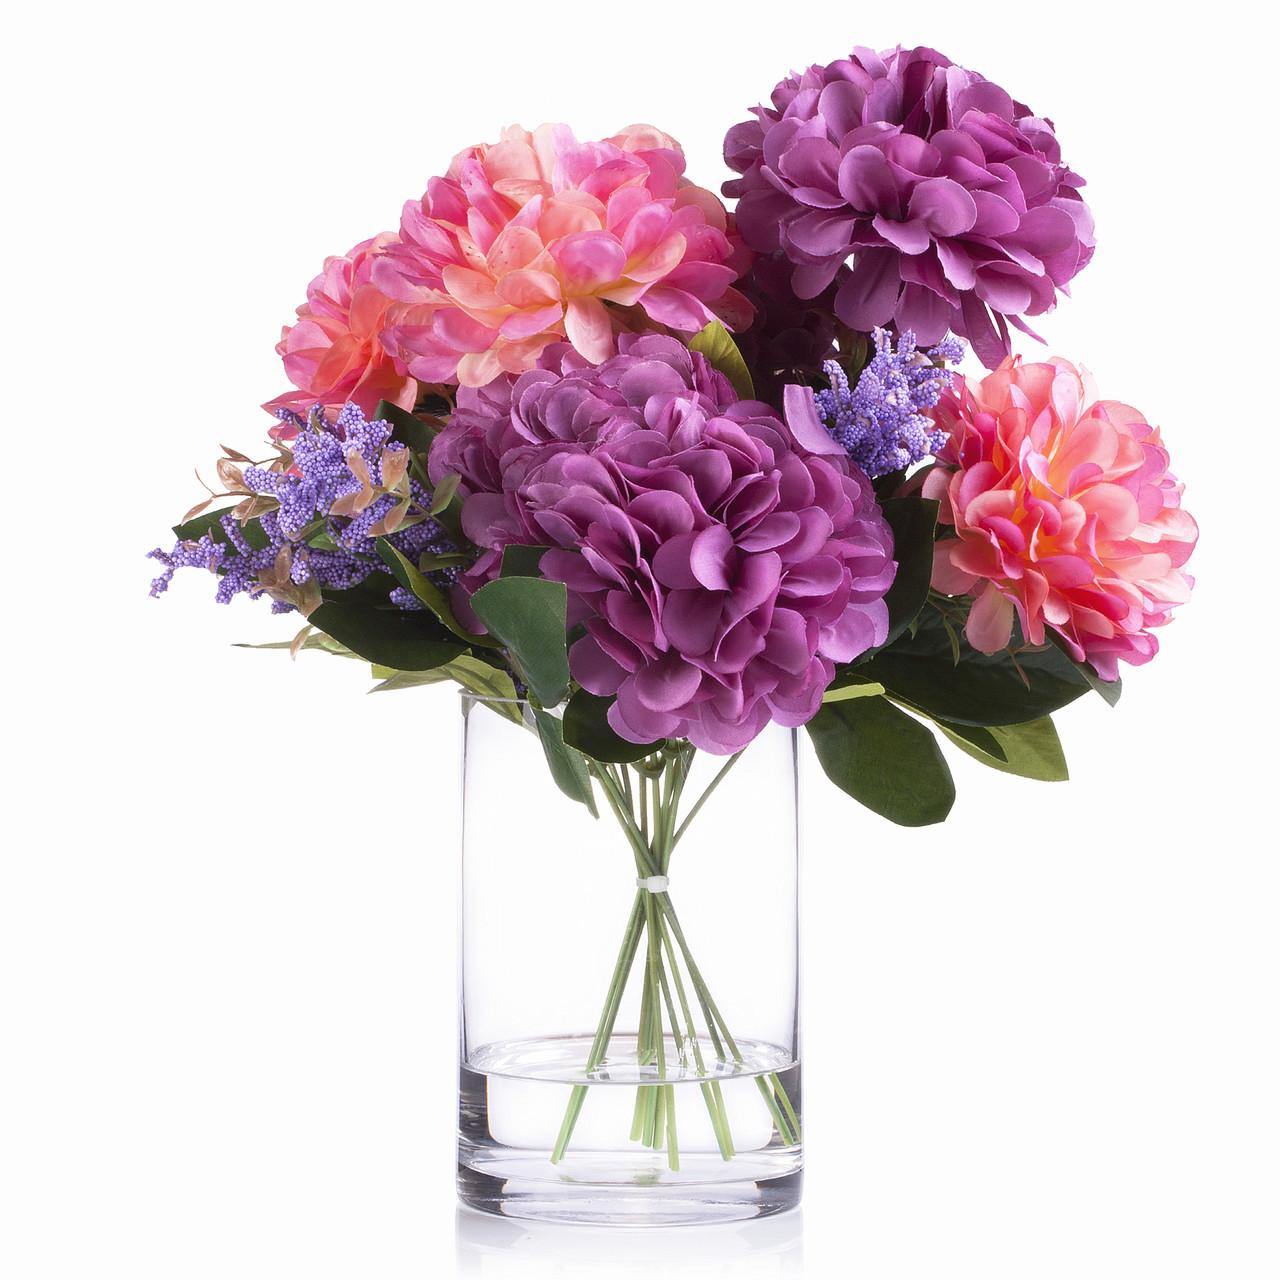 7 Heads Purple Pink Dahlia Silk Flower Arrangement In Glass Vase With Faux Water Enova Home